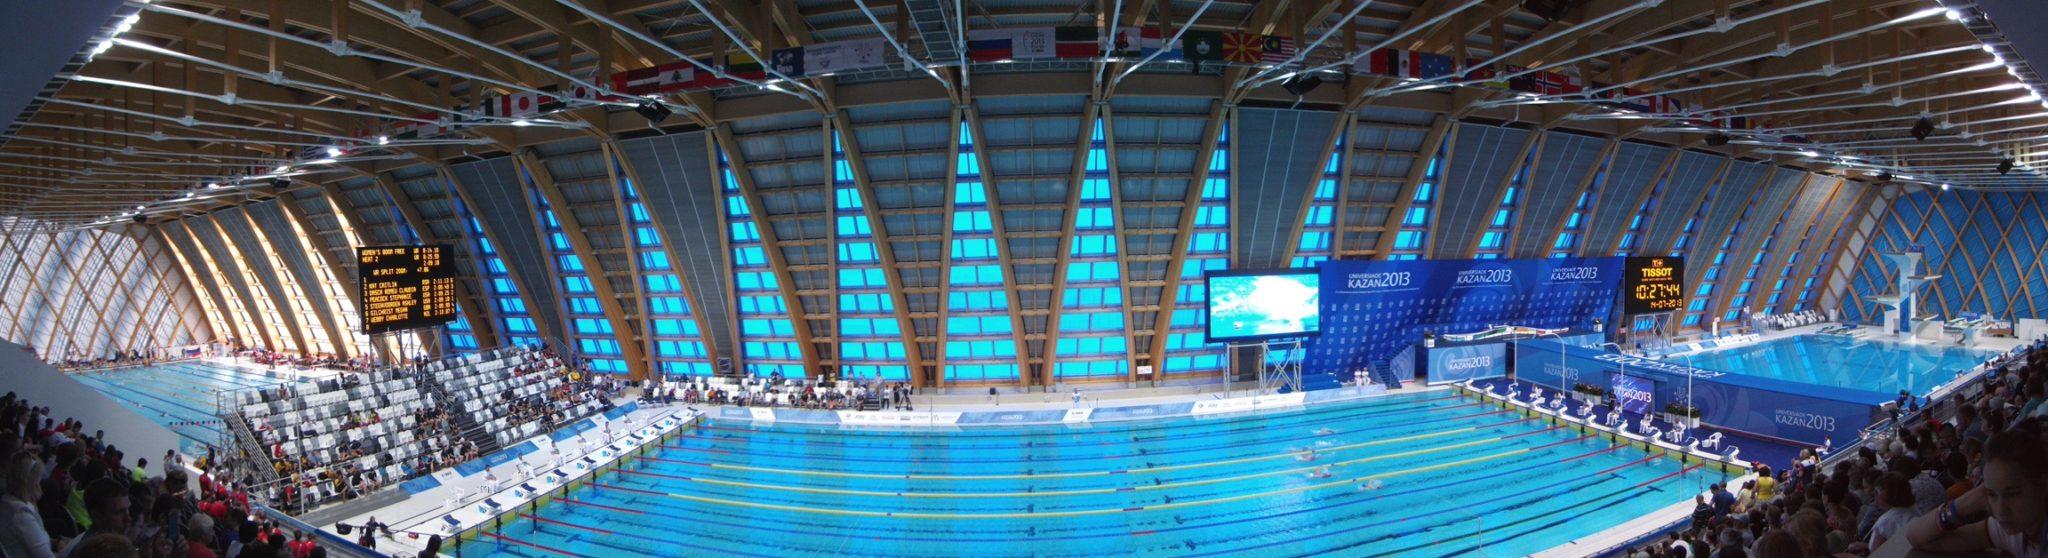 FINA Postpones World Junior Swimming Championships Until 2022 Amid Pandemic